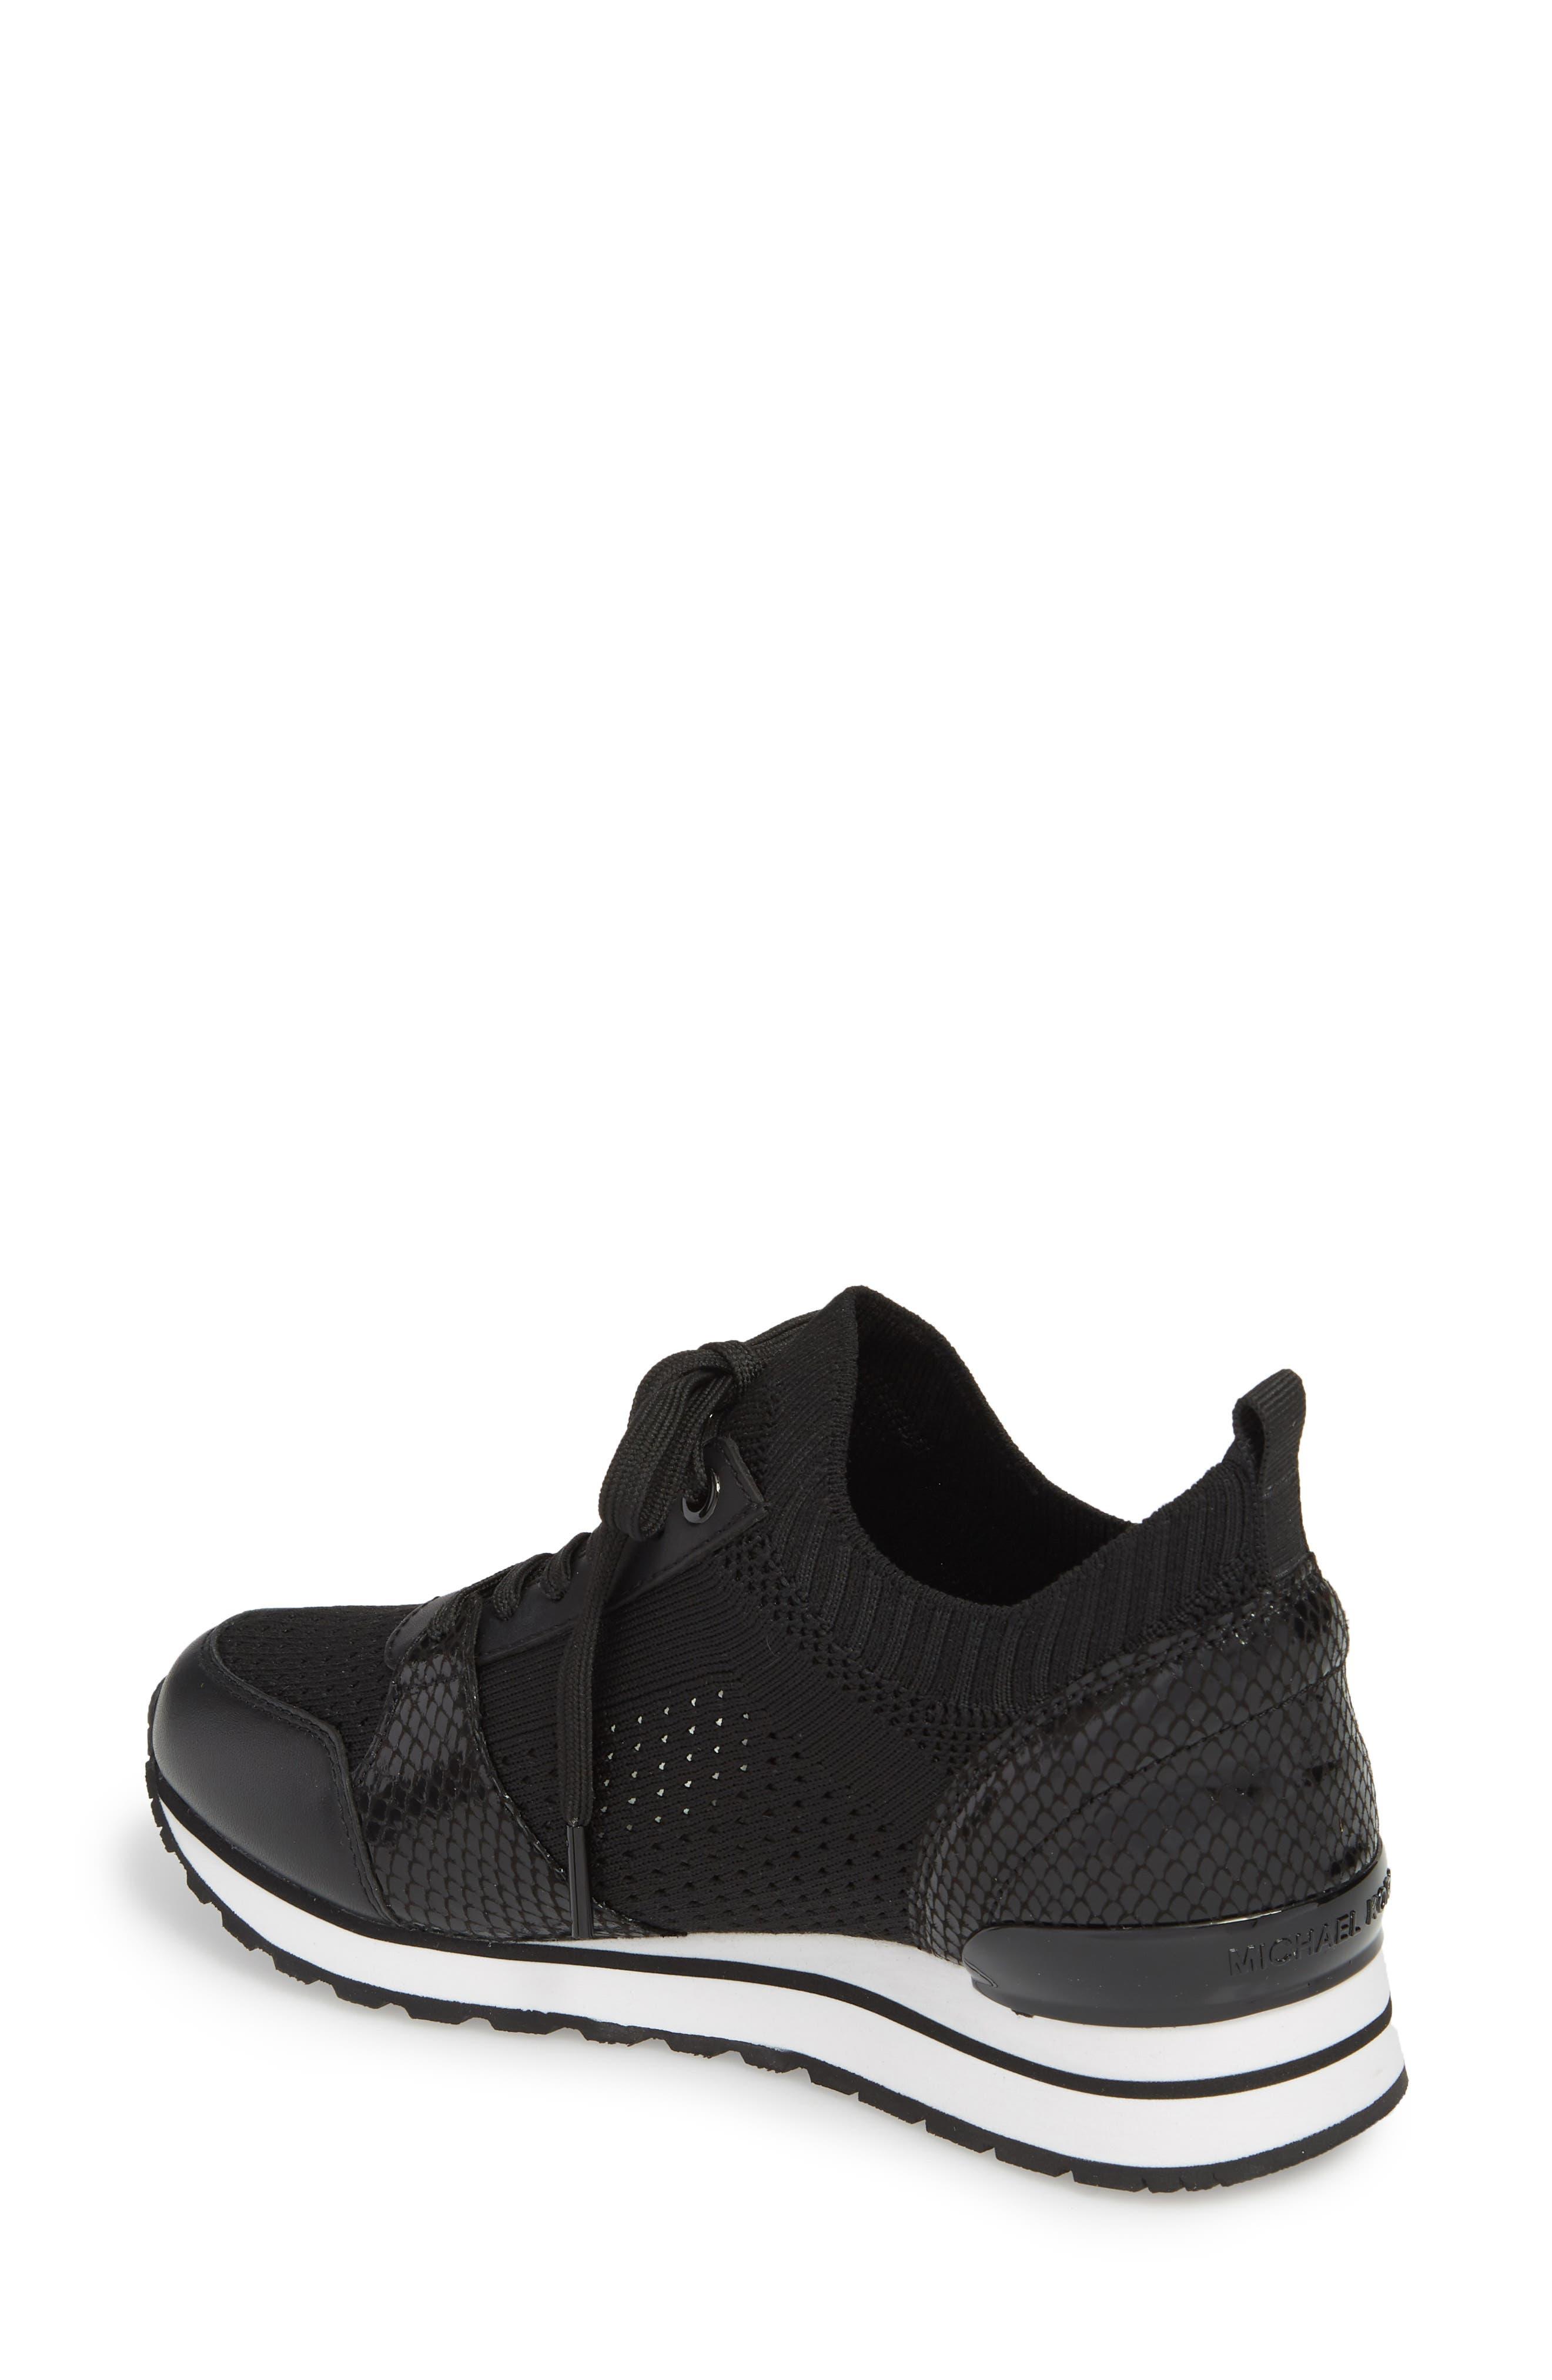 Billie Perforated Sneaker,                             Alternate thumbnail 2, color,                             002